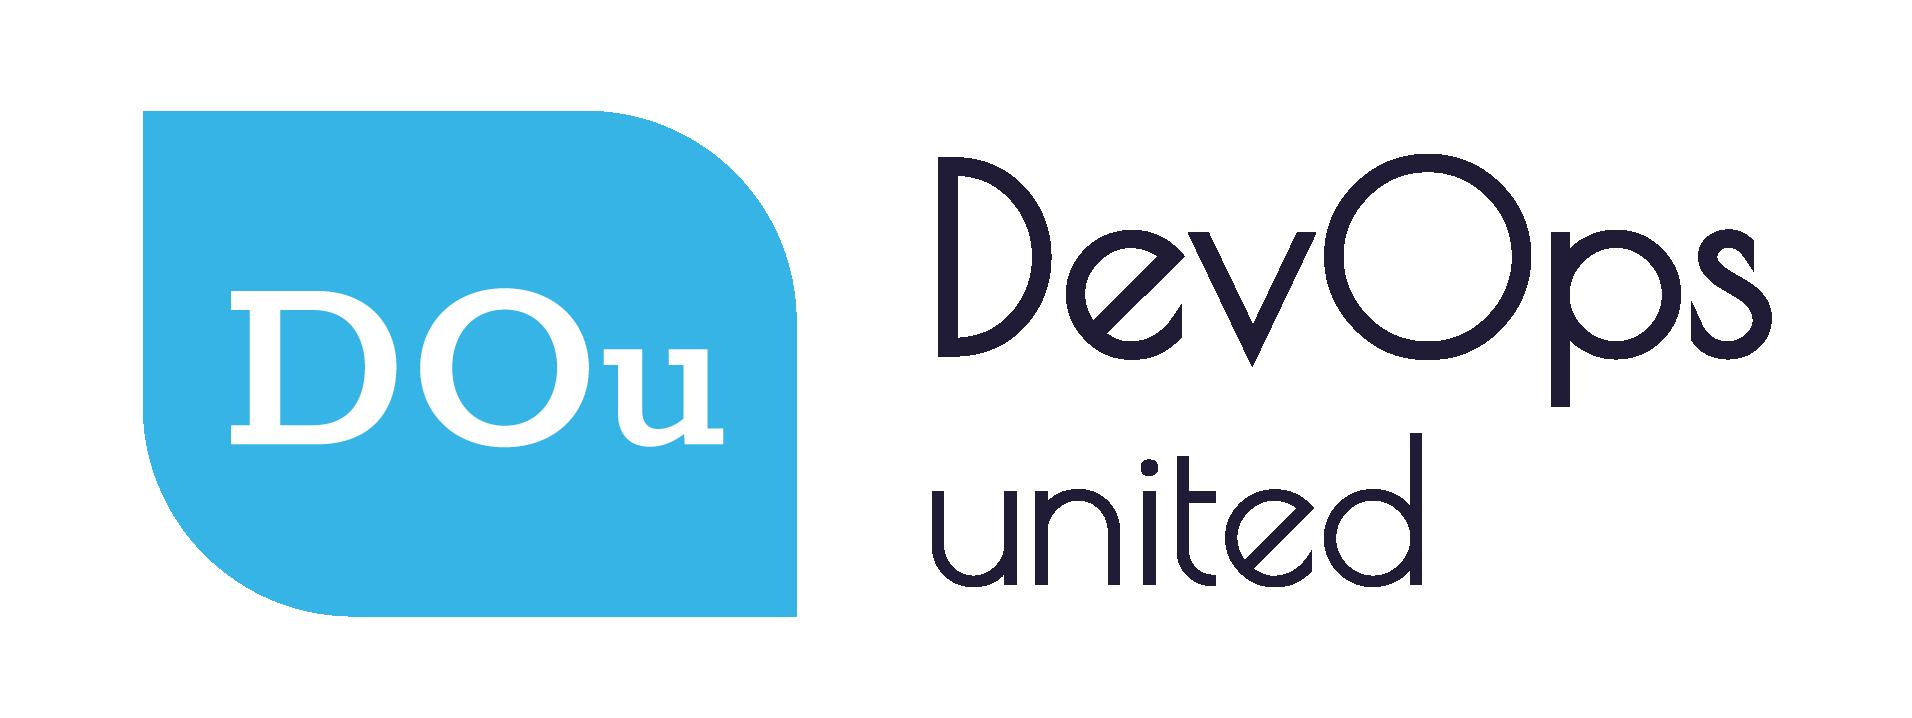 DOu CTD-logo